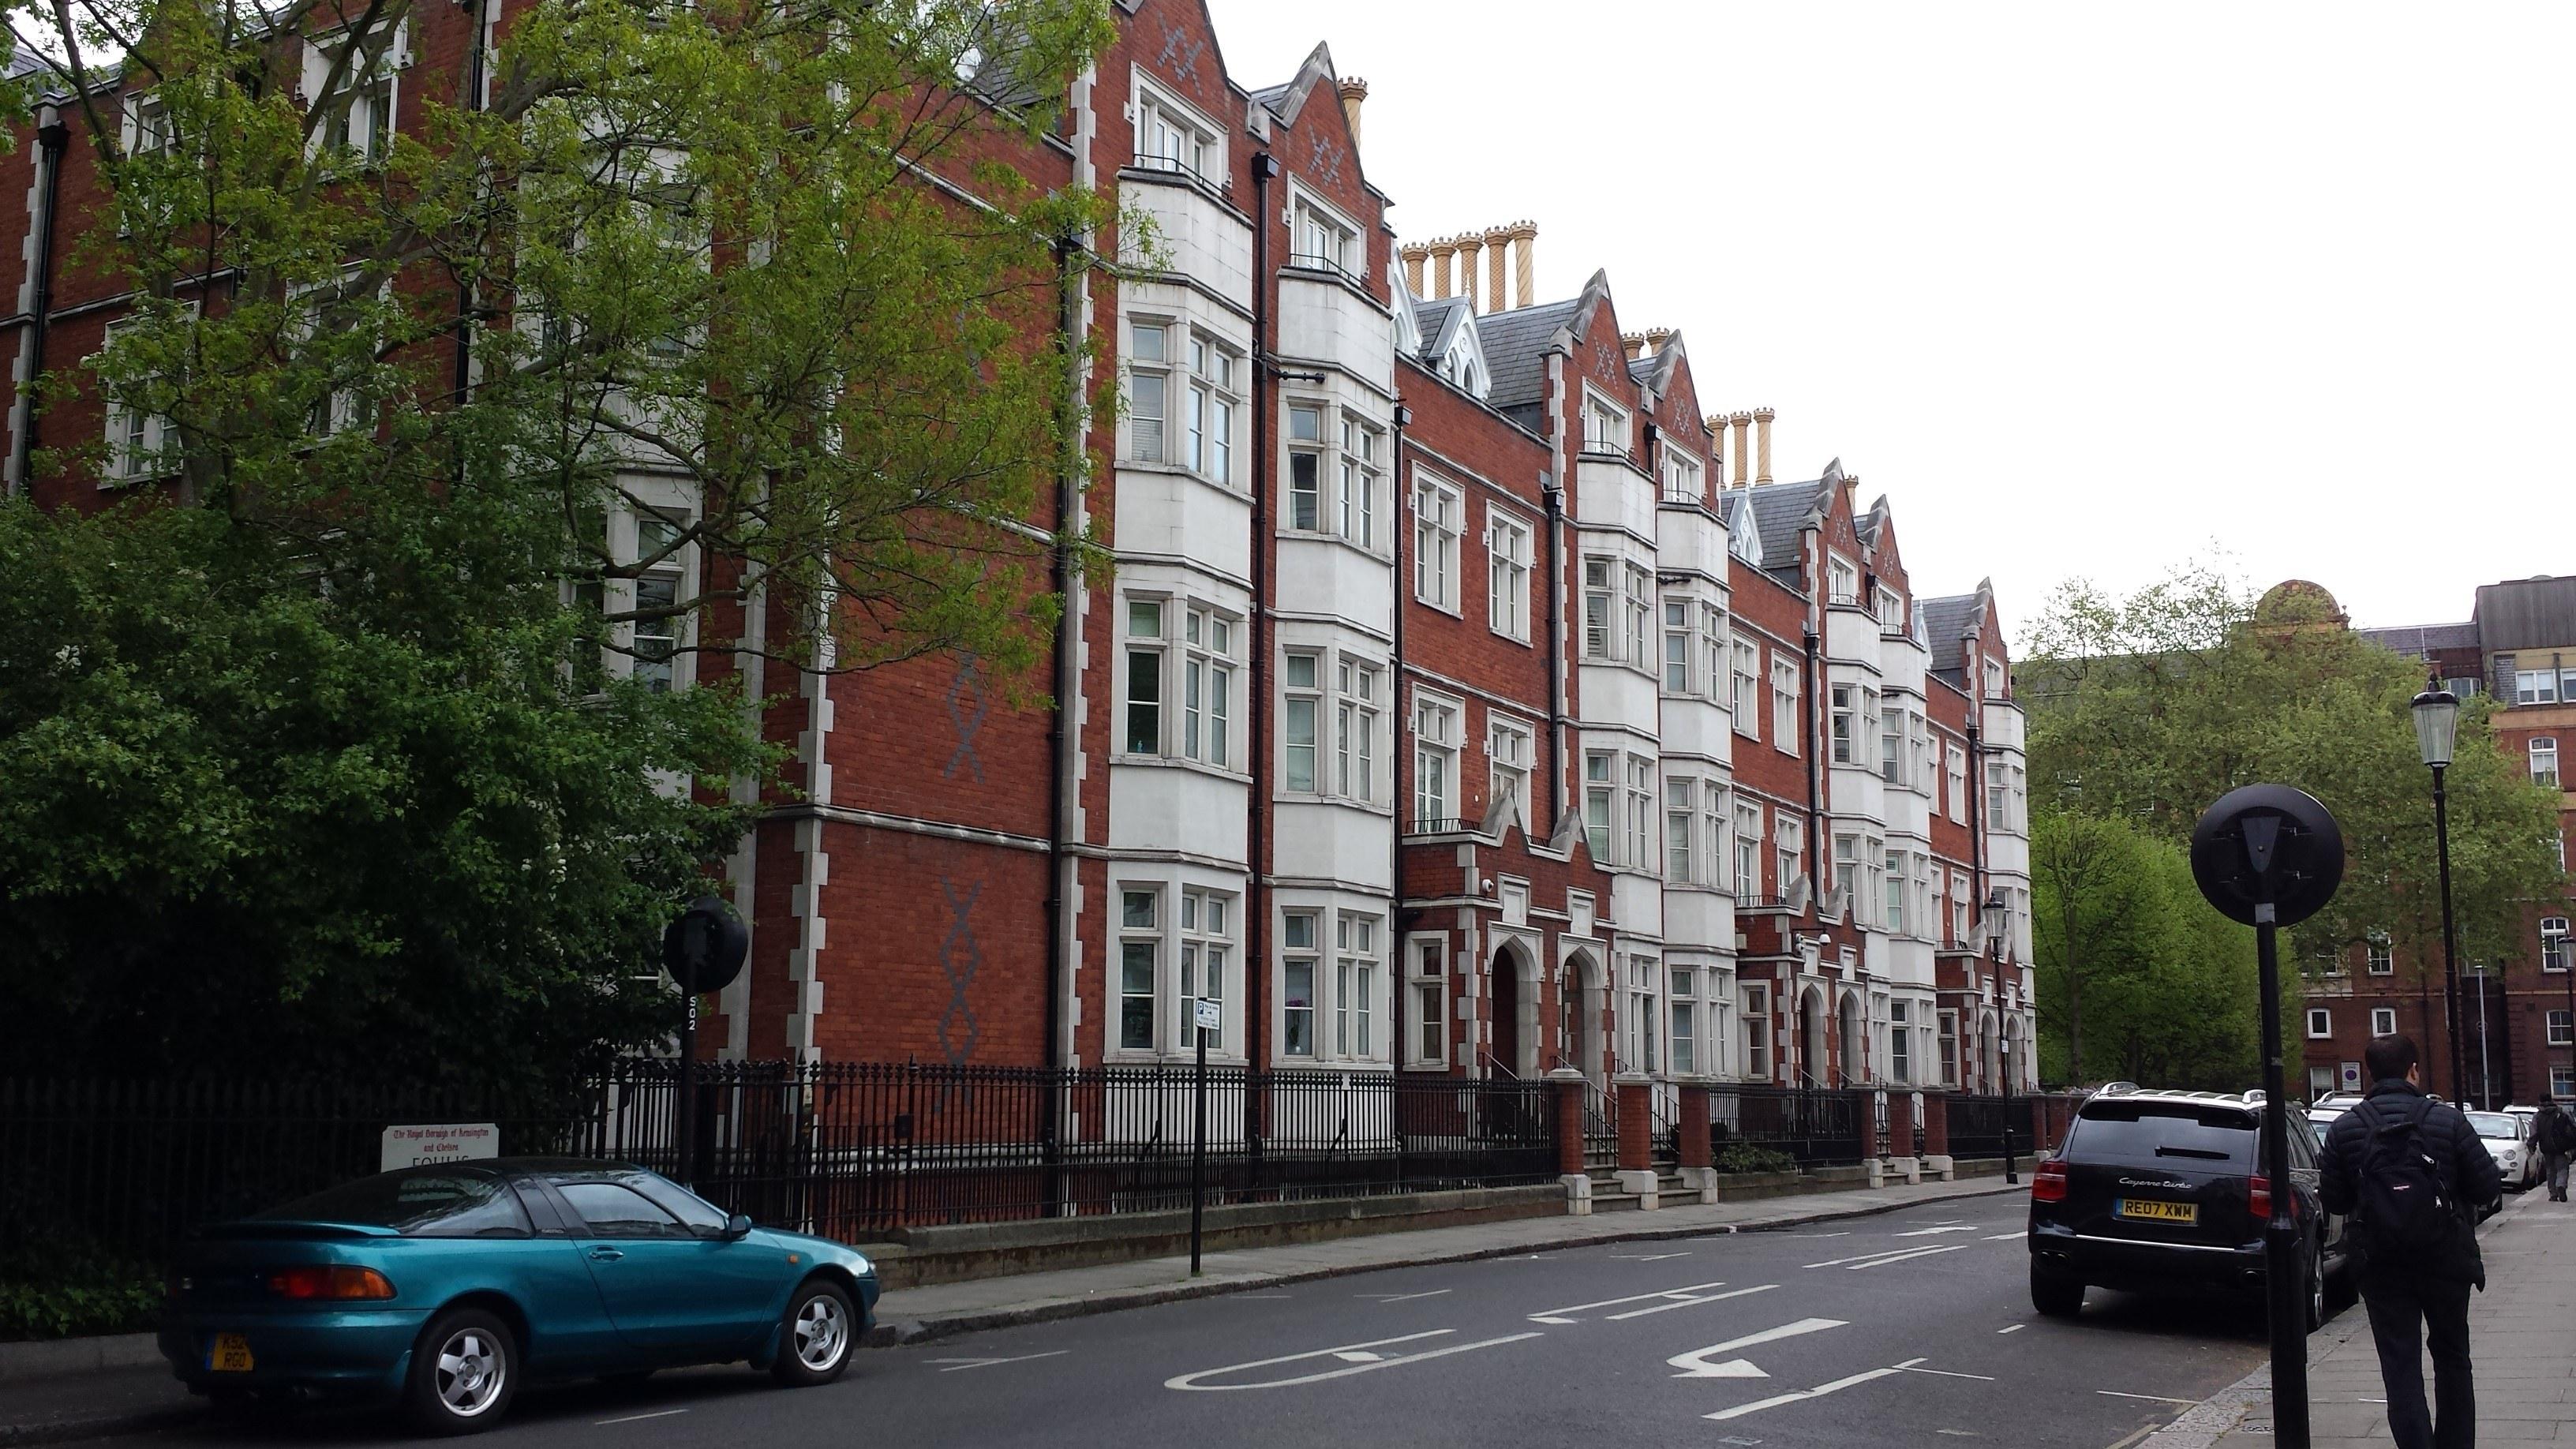 St Luke's Chapel, Fulham Road, Chelsea